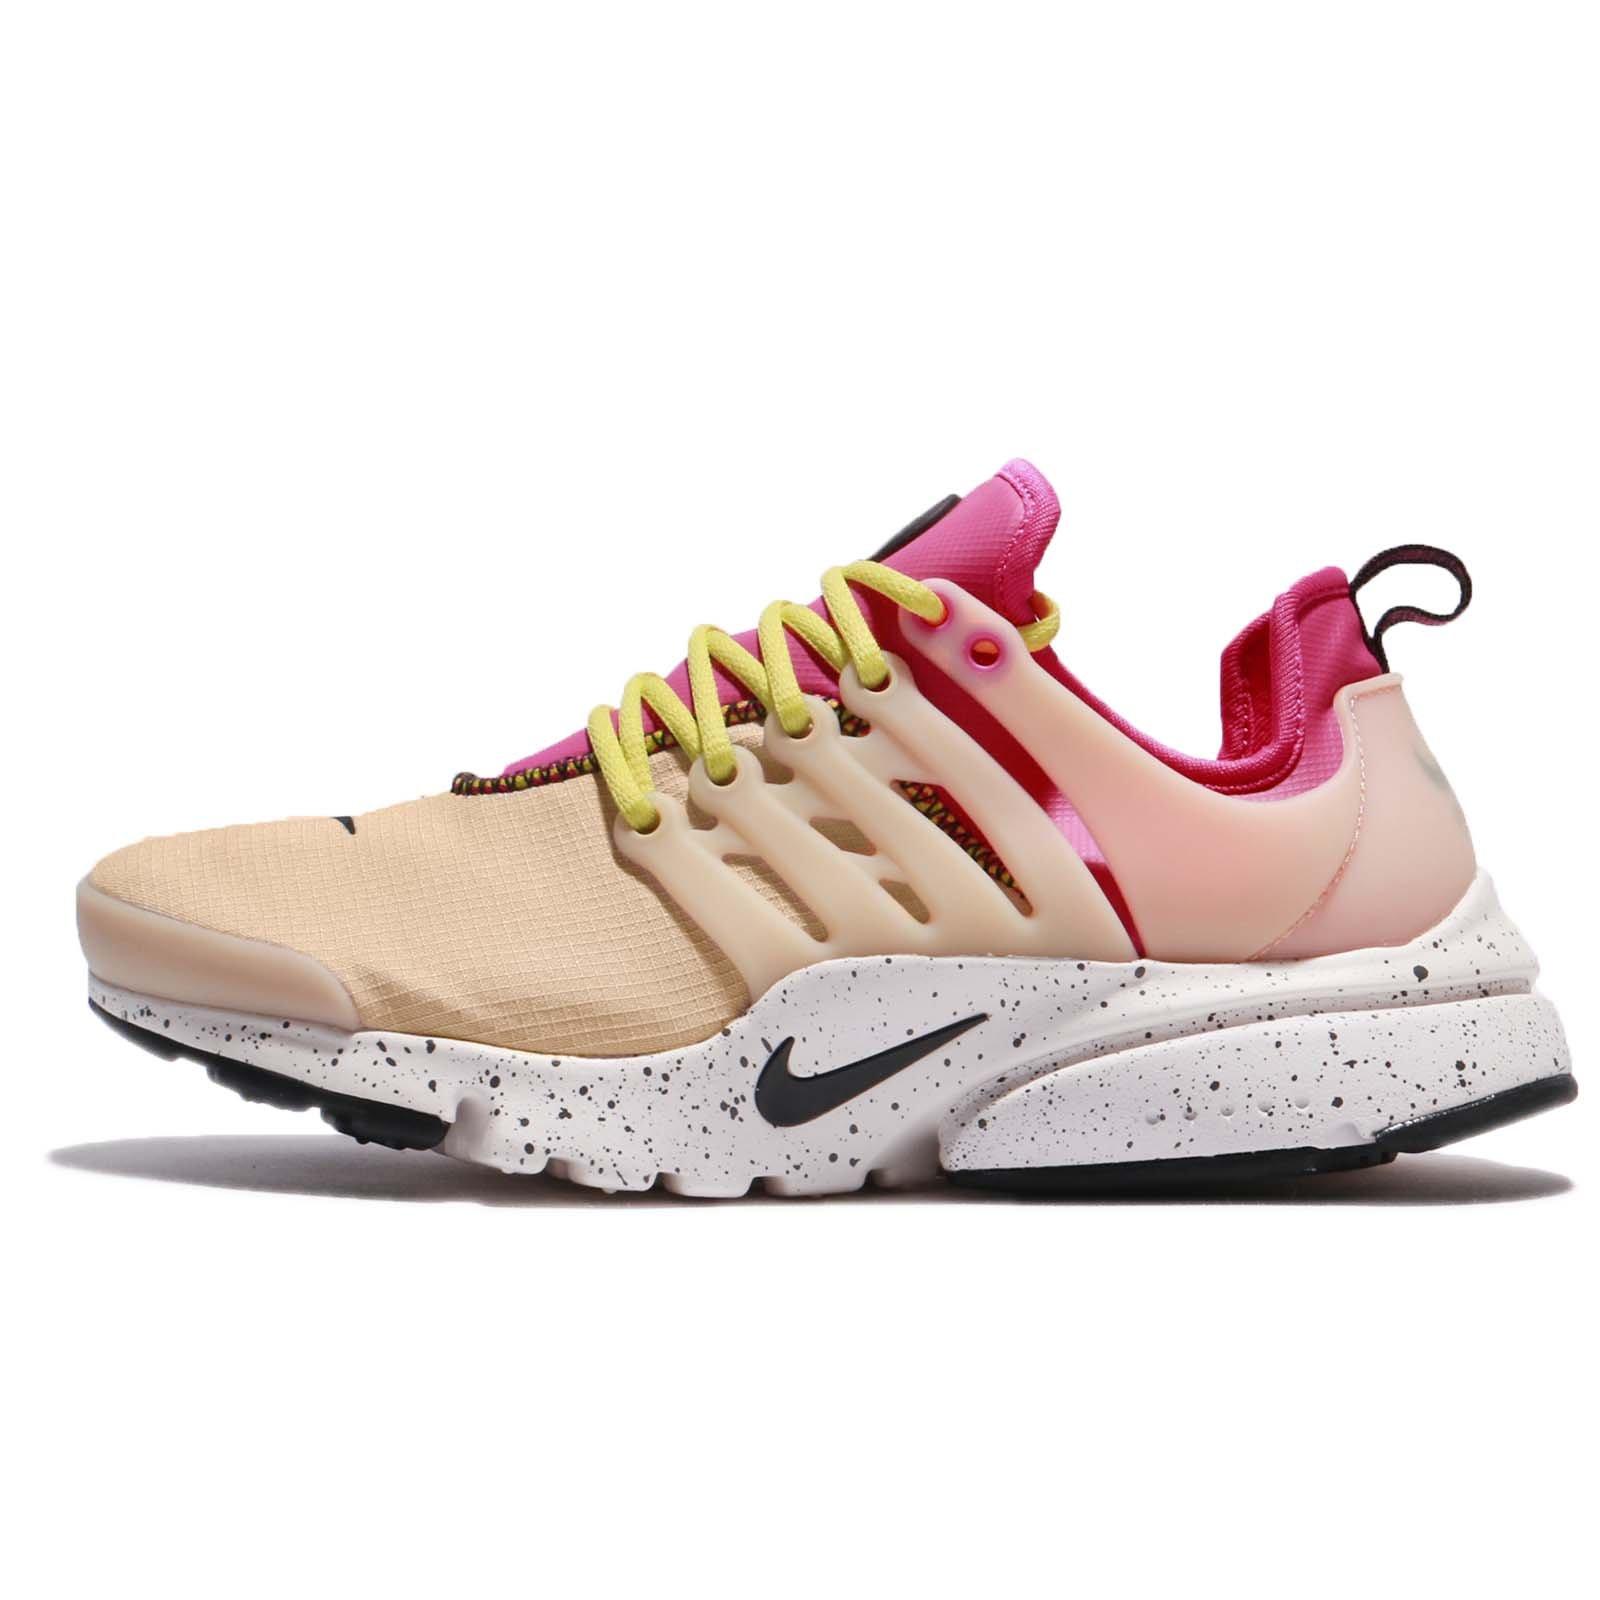 separation shoes 5d858 9b621 Nike Women's WMNS Air Presto Ultra SI, Mushroom/Deadly Pink-Black, 7 US